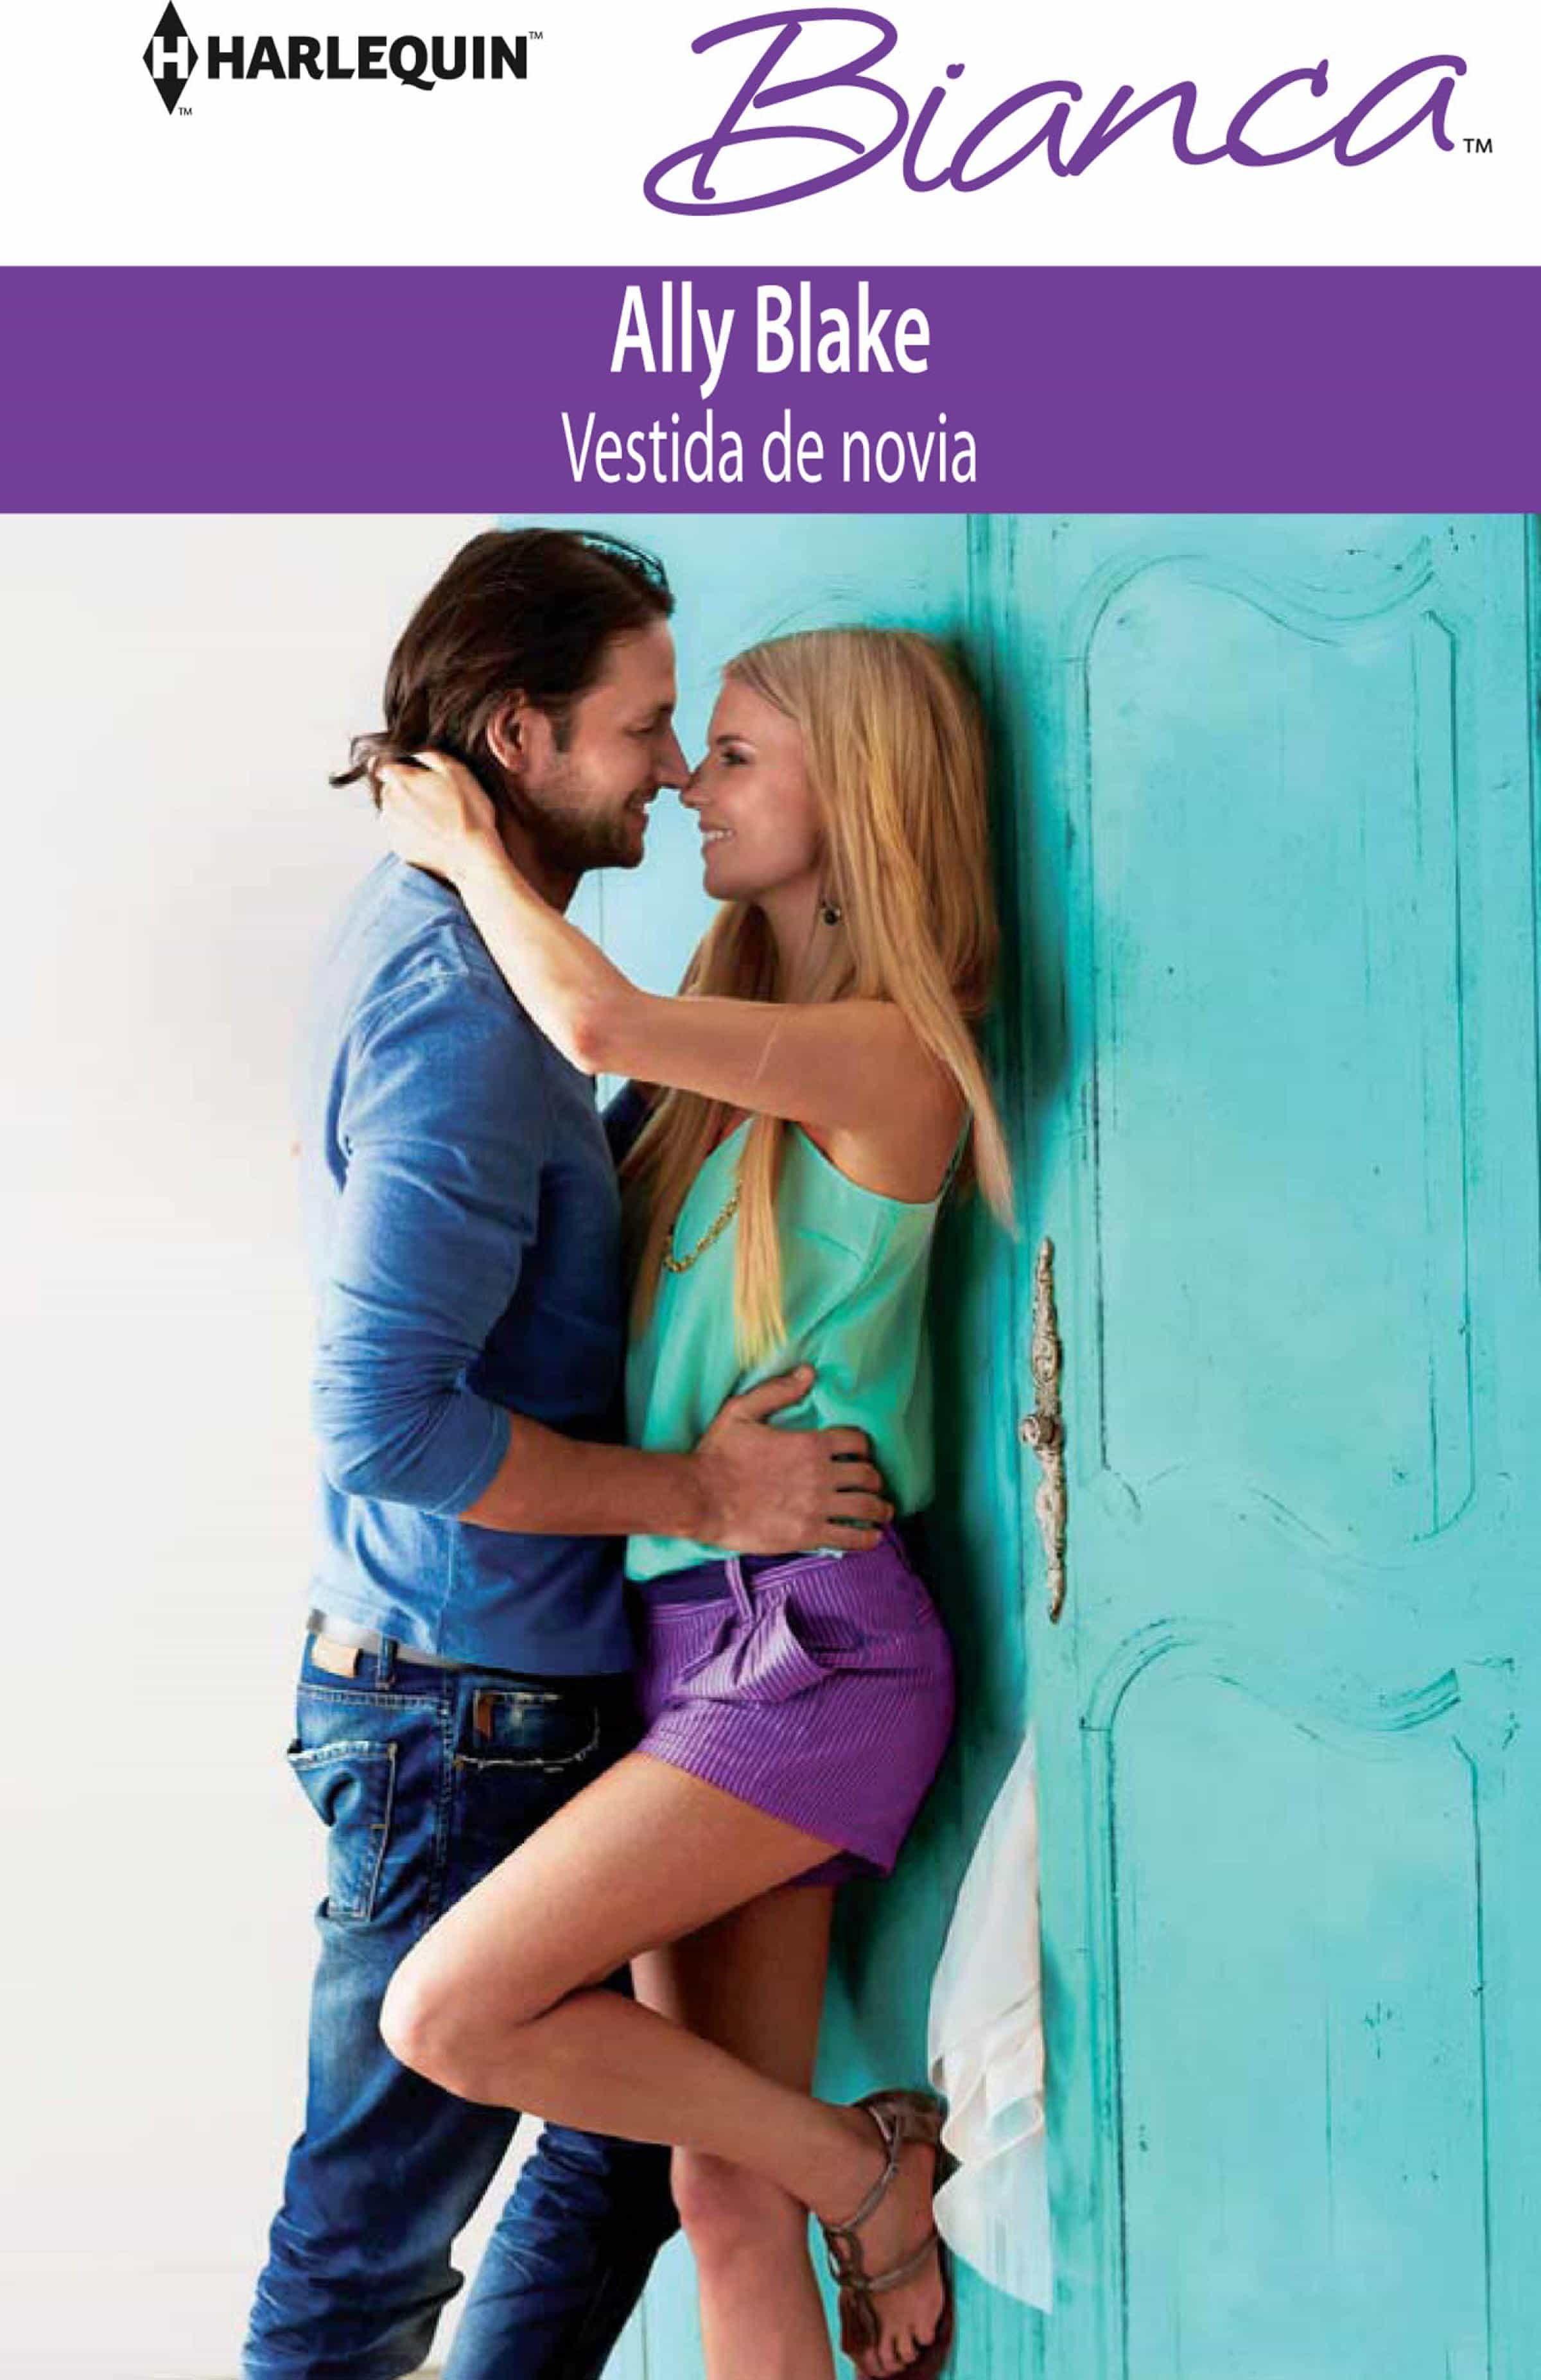 VESTIDA DE NOVIA EBOOK   ALLY BLAKE   Descargar libro PDF o EPUB ...